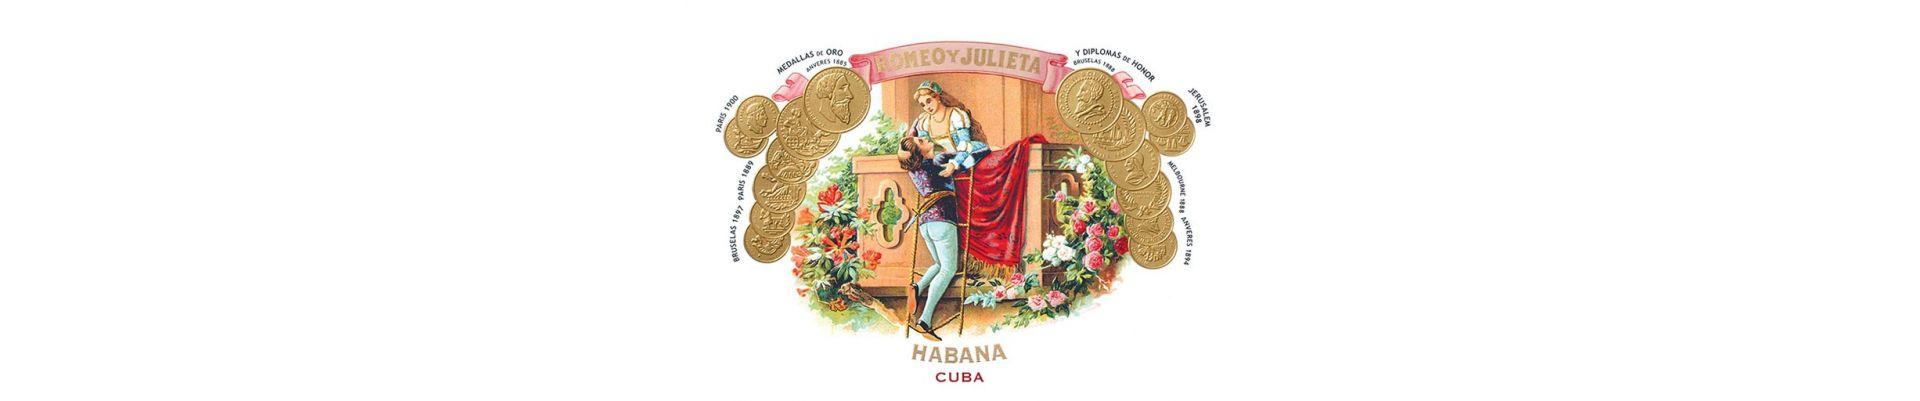 Trabucuri Romeo y Julieta trabucuri cubaneze Romeo y Julieta pret